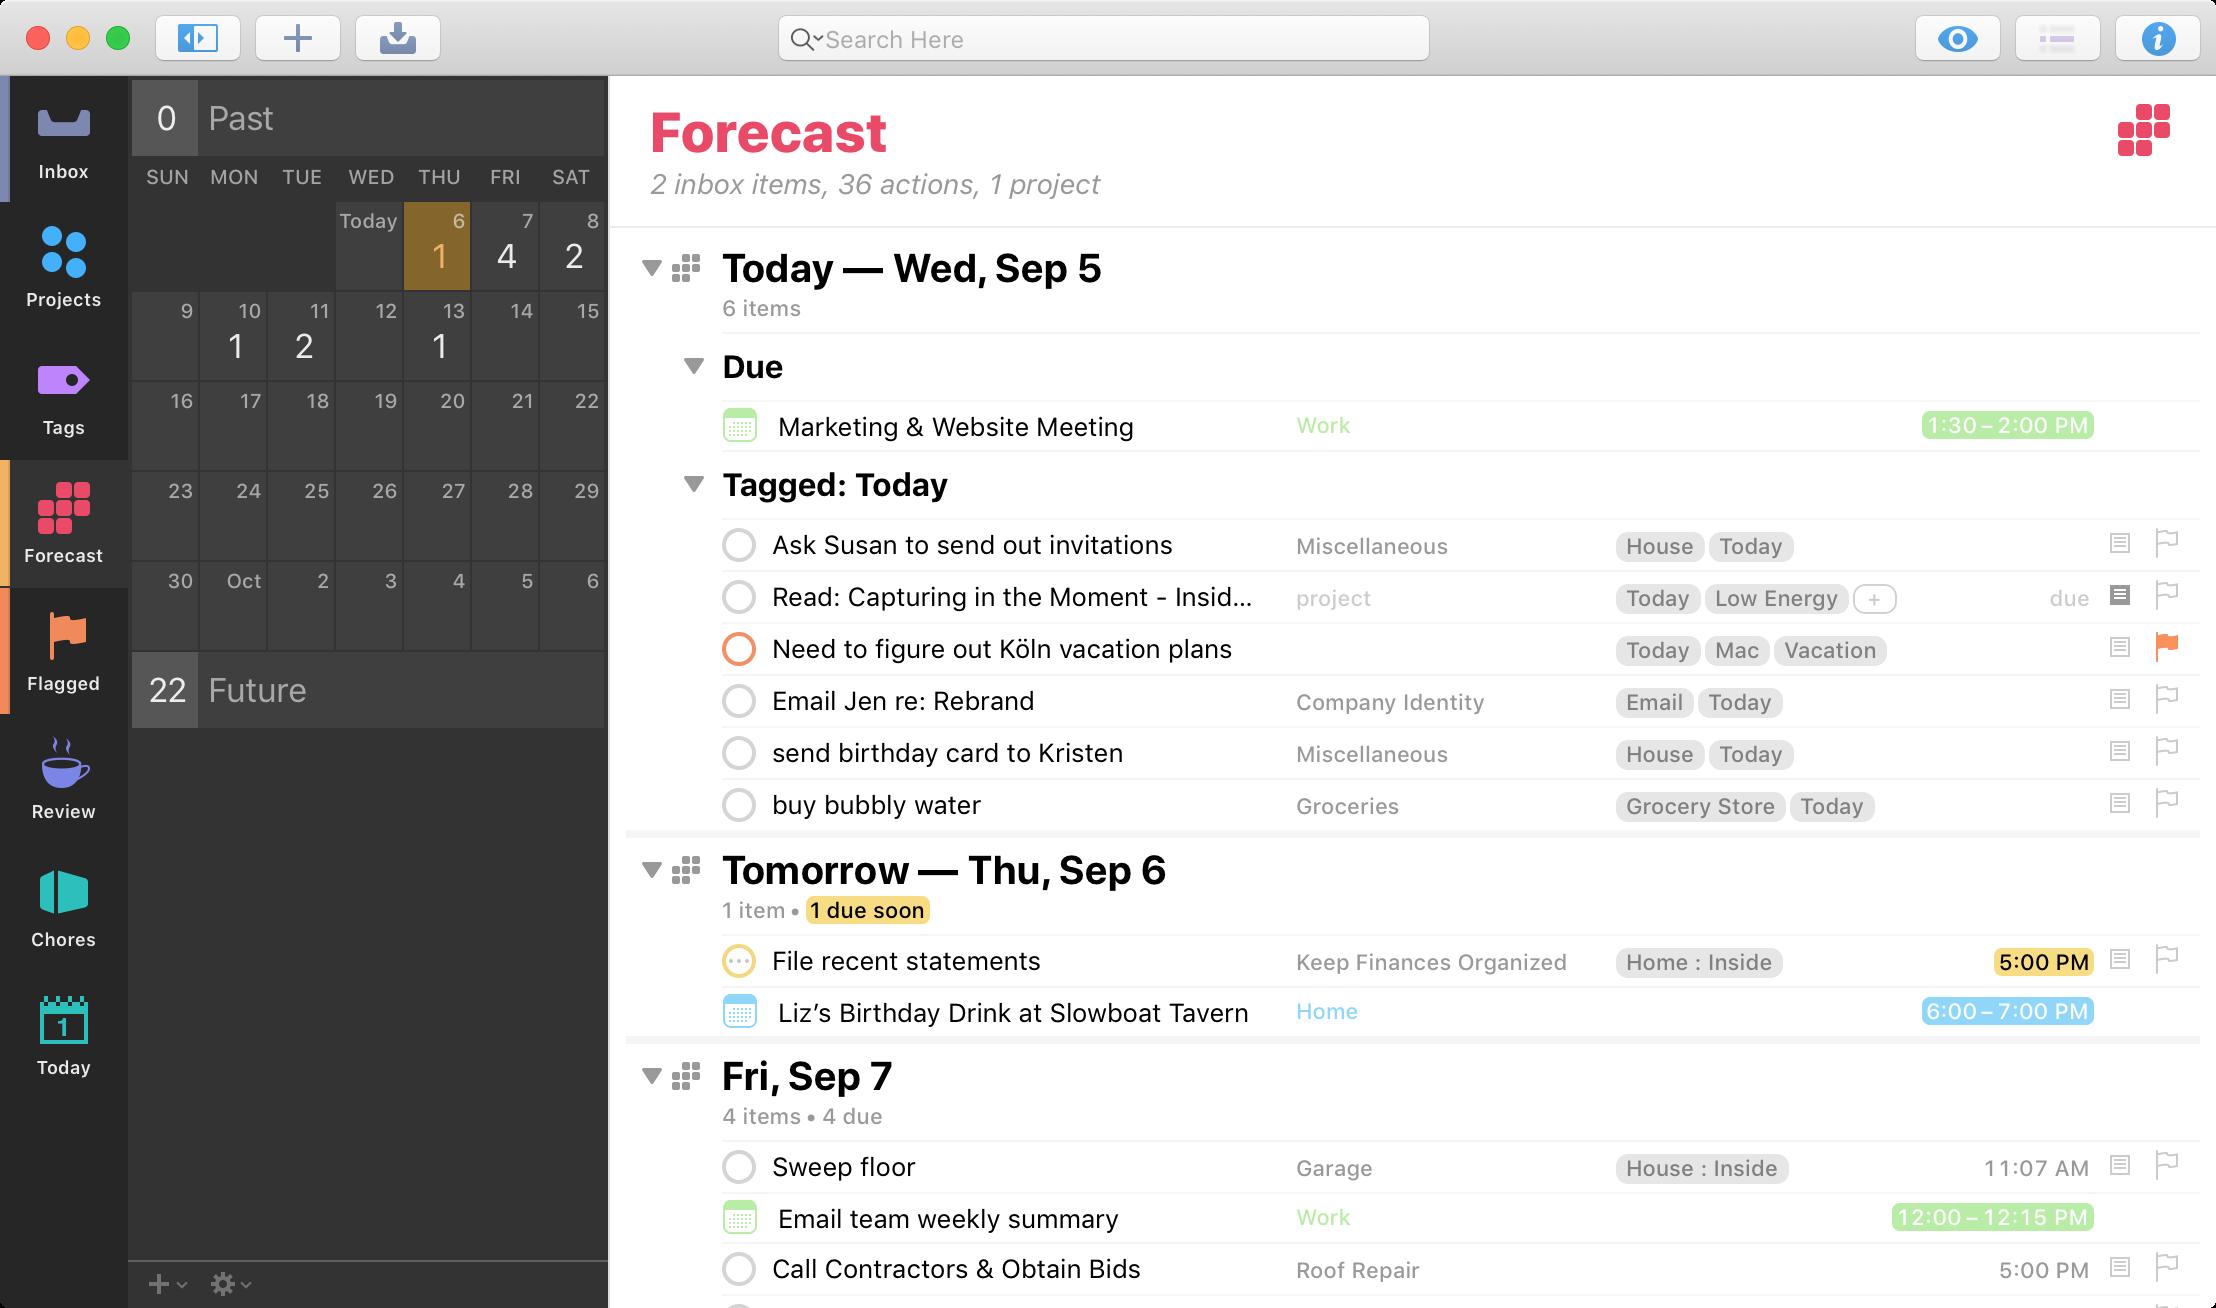 OmniFocus 3 - forecast-2 - SAC Student Discount.png